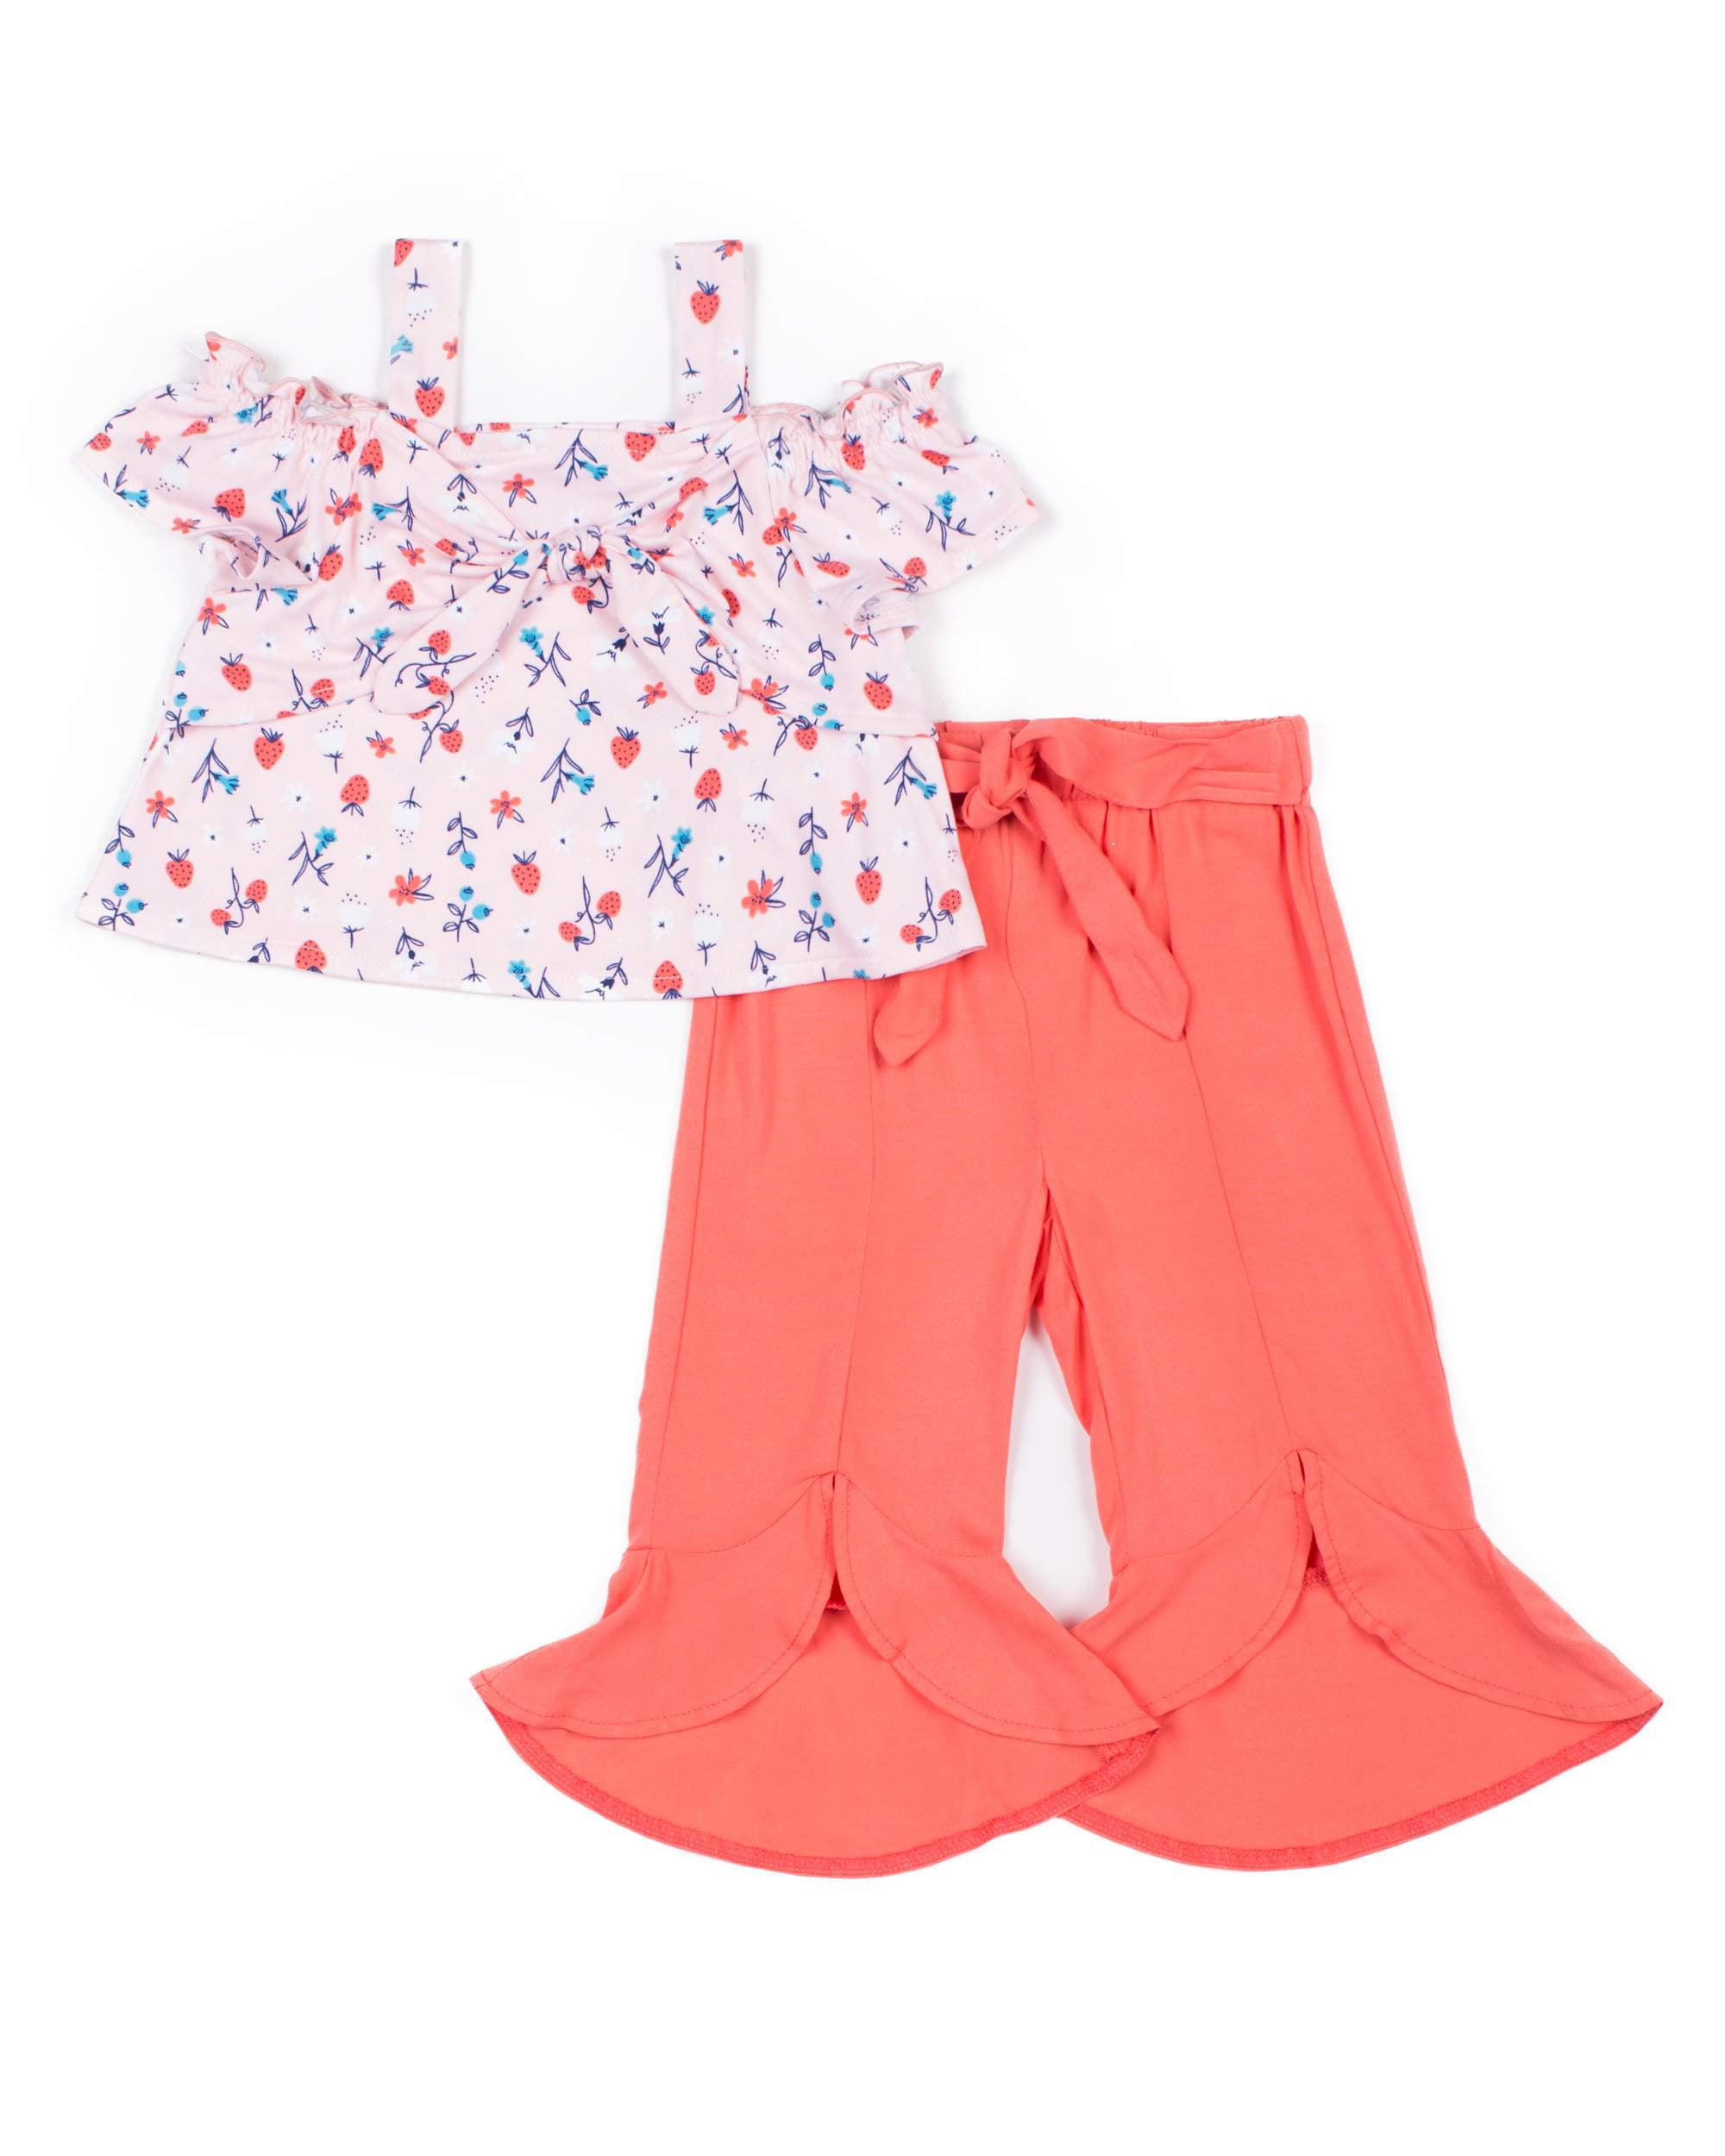 Cold Shoulder Floral Top and Gauze Culotte, 2-Piece Outfit Set (Little Girls)